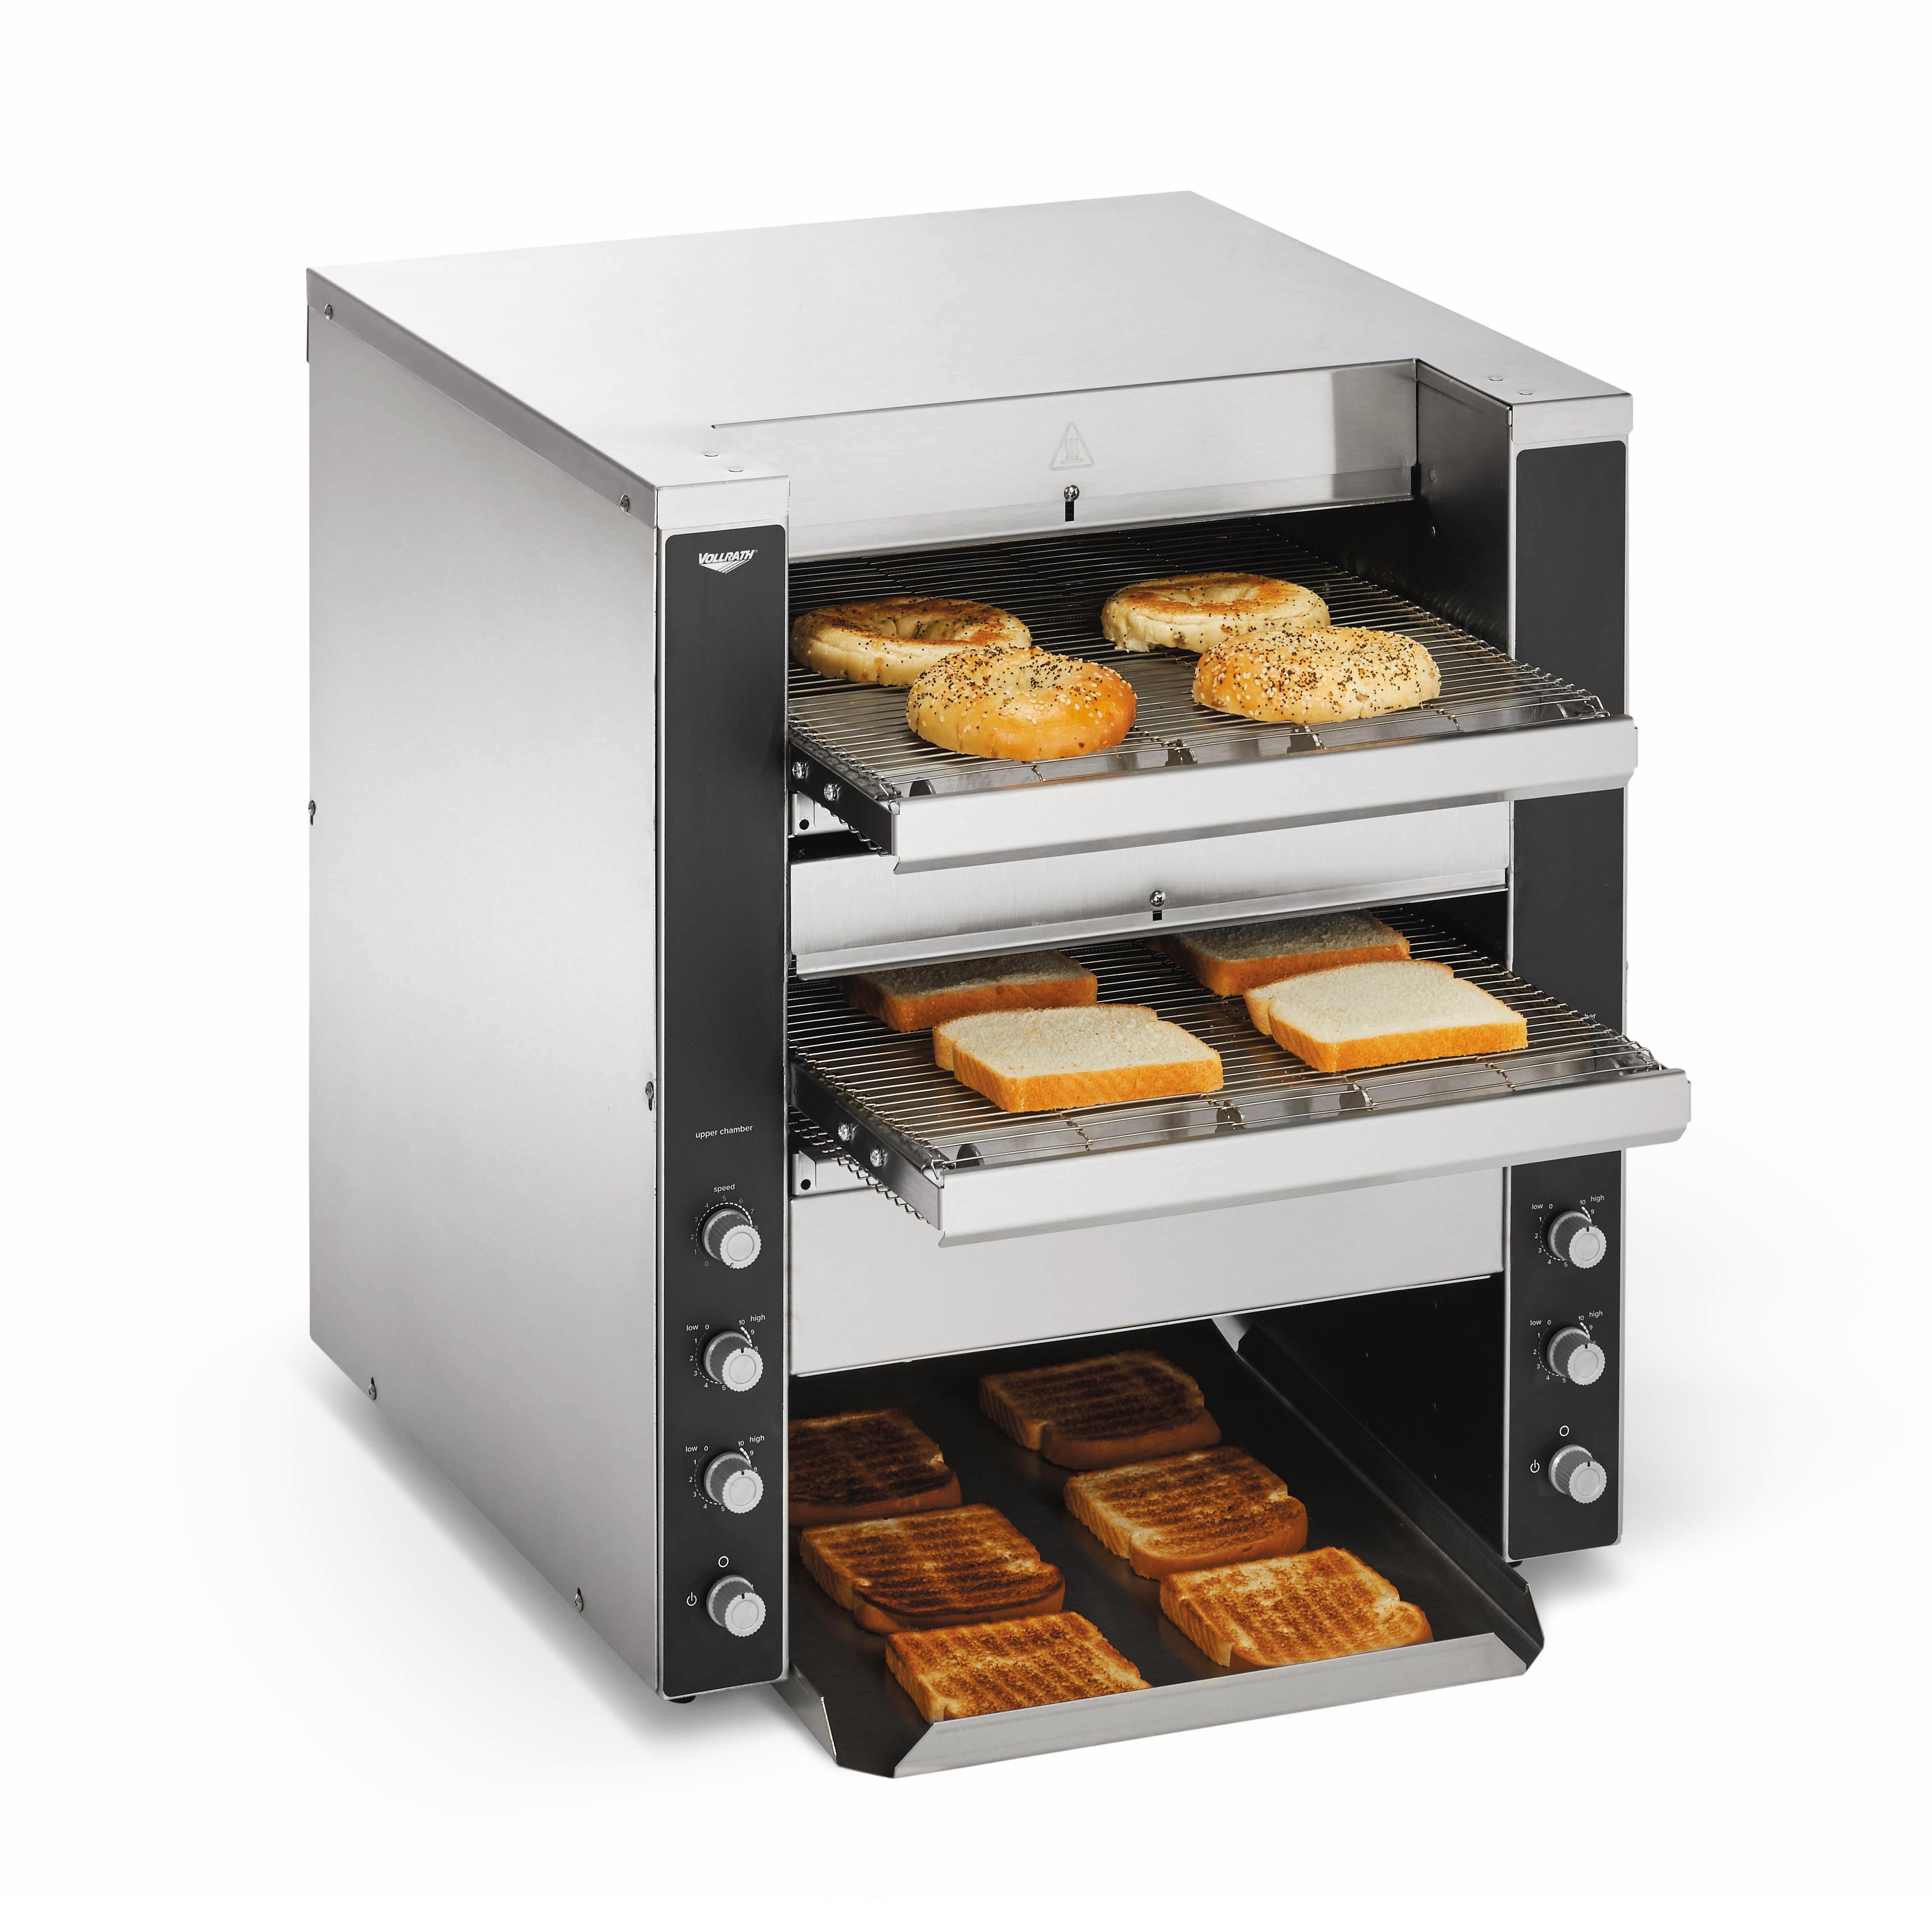 Vollrath CVT4-220DUAL toaster, conveyor type